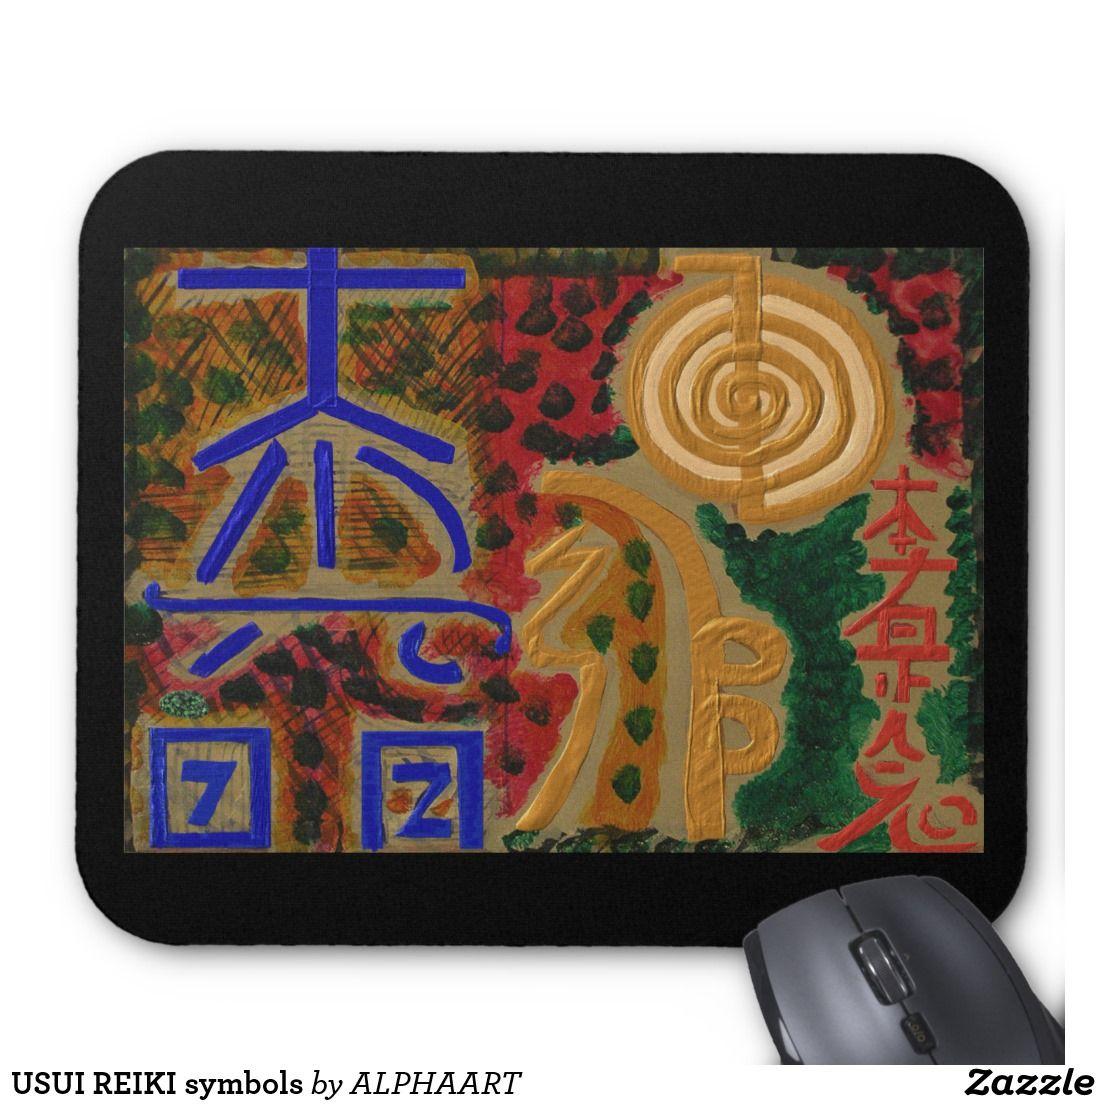 Usui reiki symbols mouse pad reiki symbols usui reiki symbols mouse pad biocorpaavc